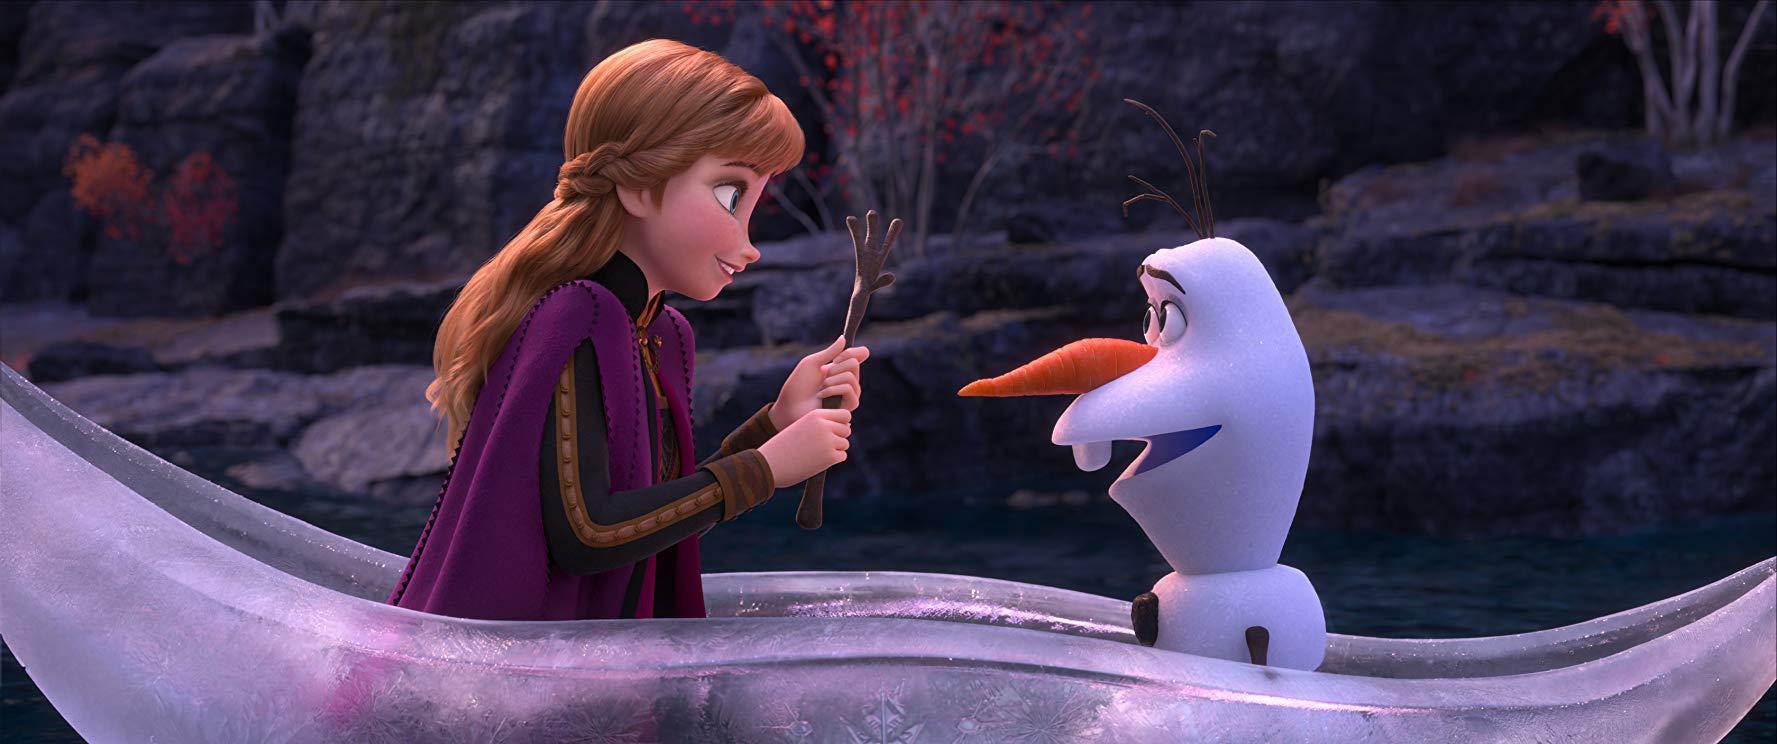 Frozen 2 faz estreia mundial de US$ 350 milhões